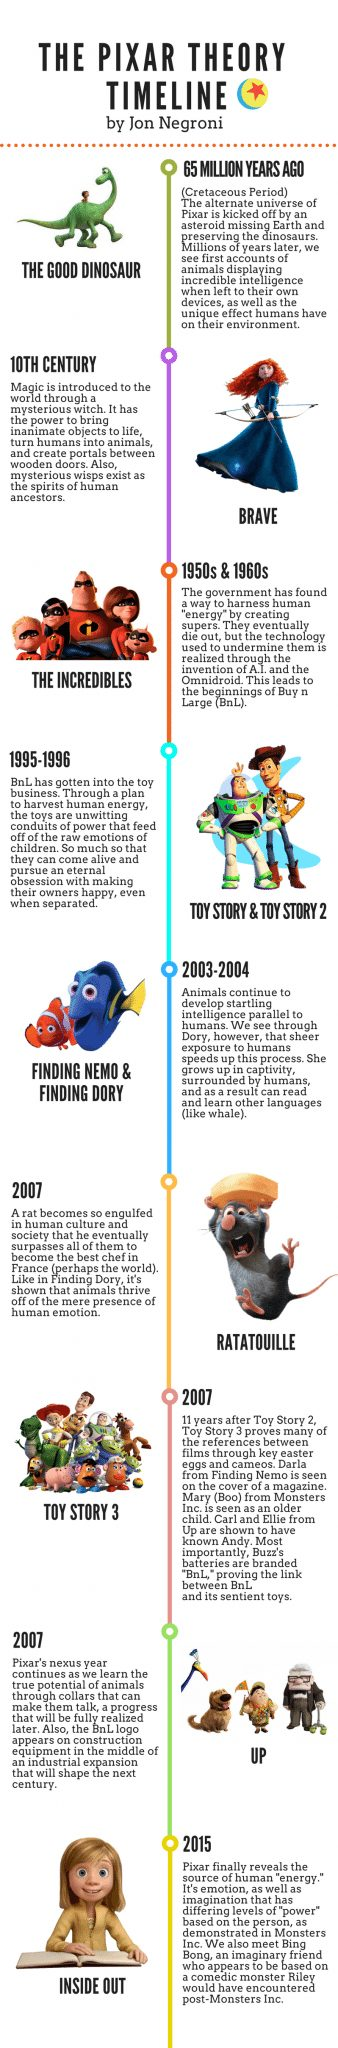 Pixar Theory Timeline